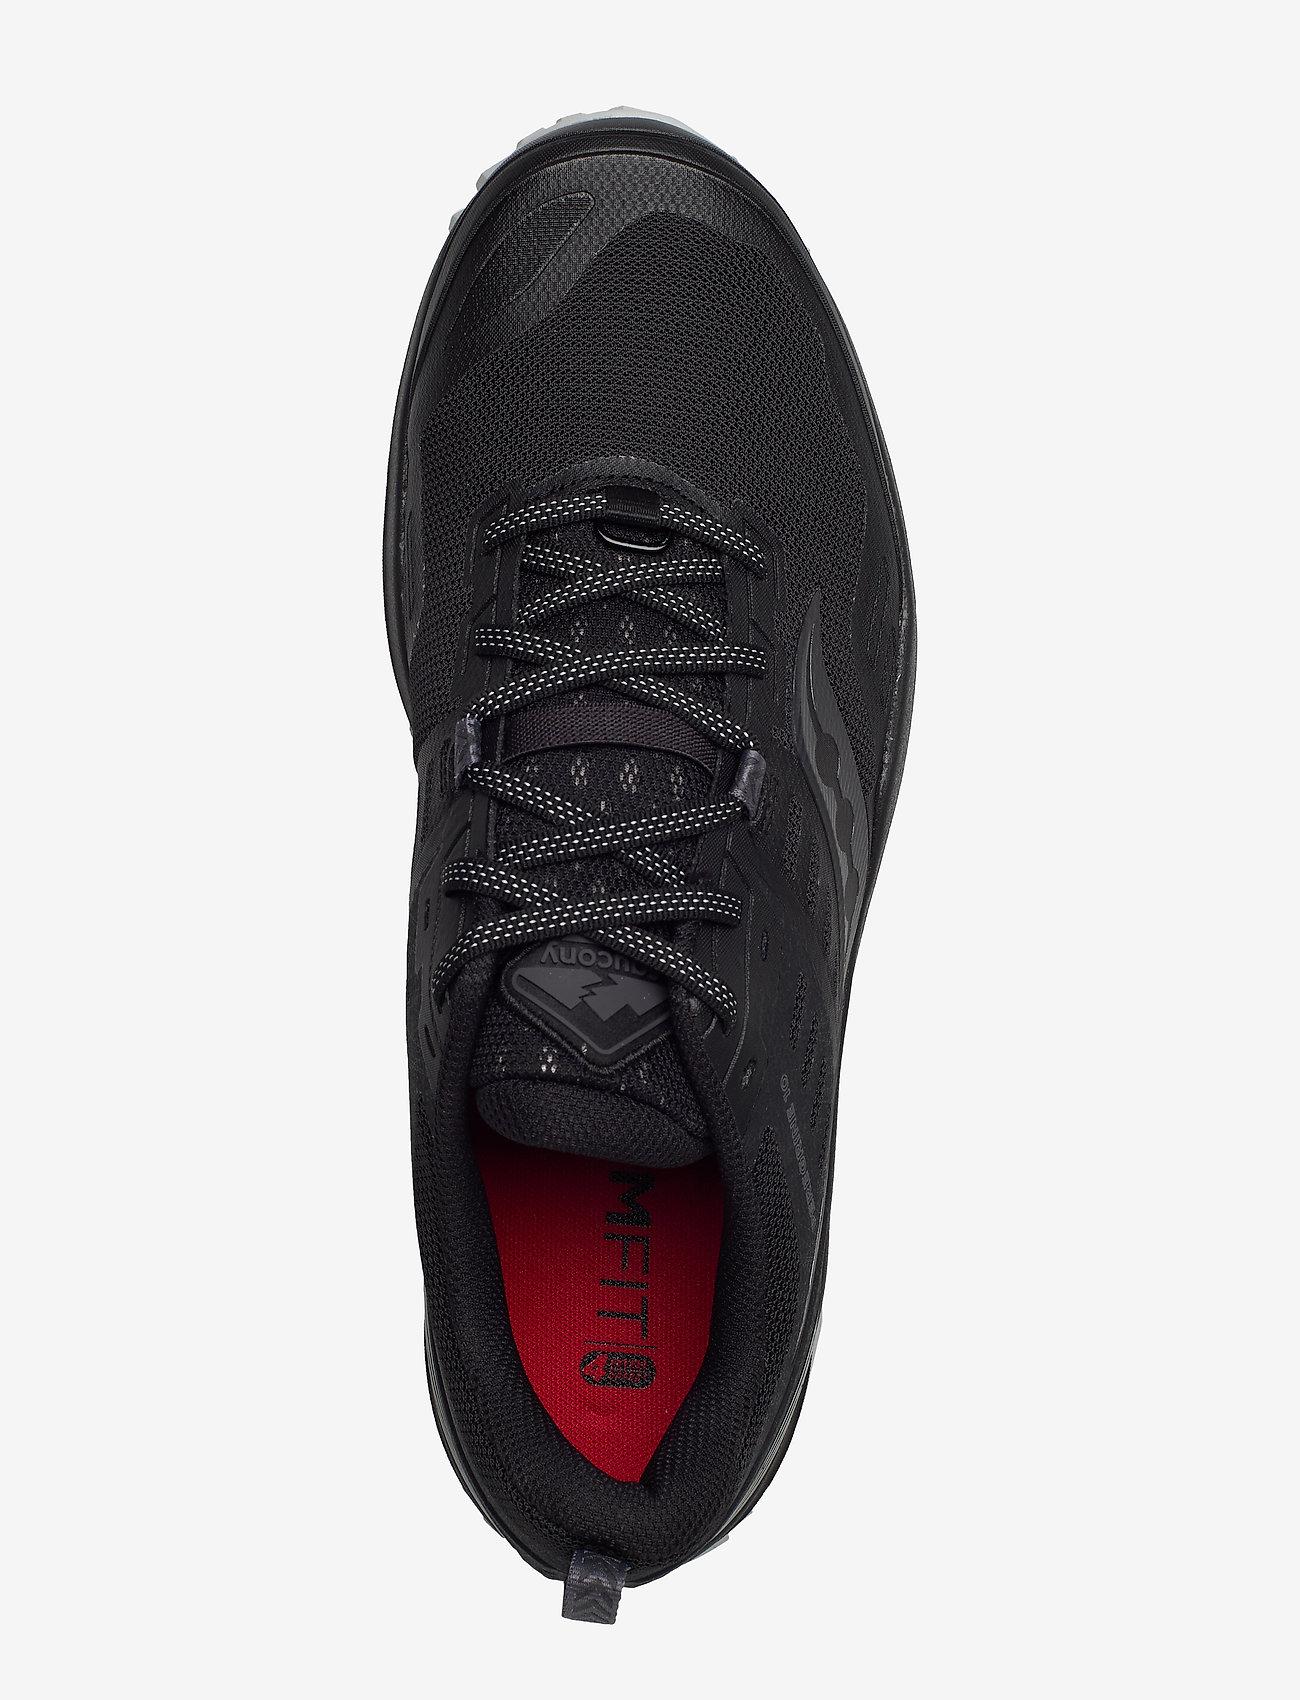 Peregrine 10 (Black/red) - Saucony